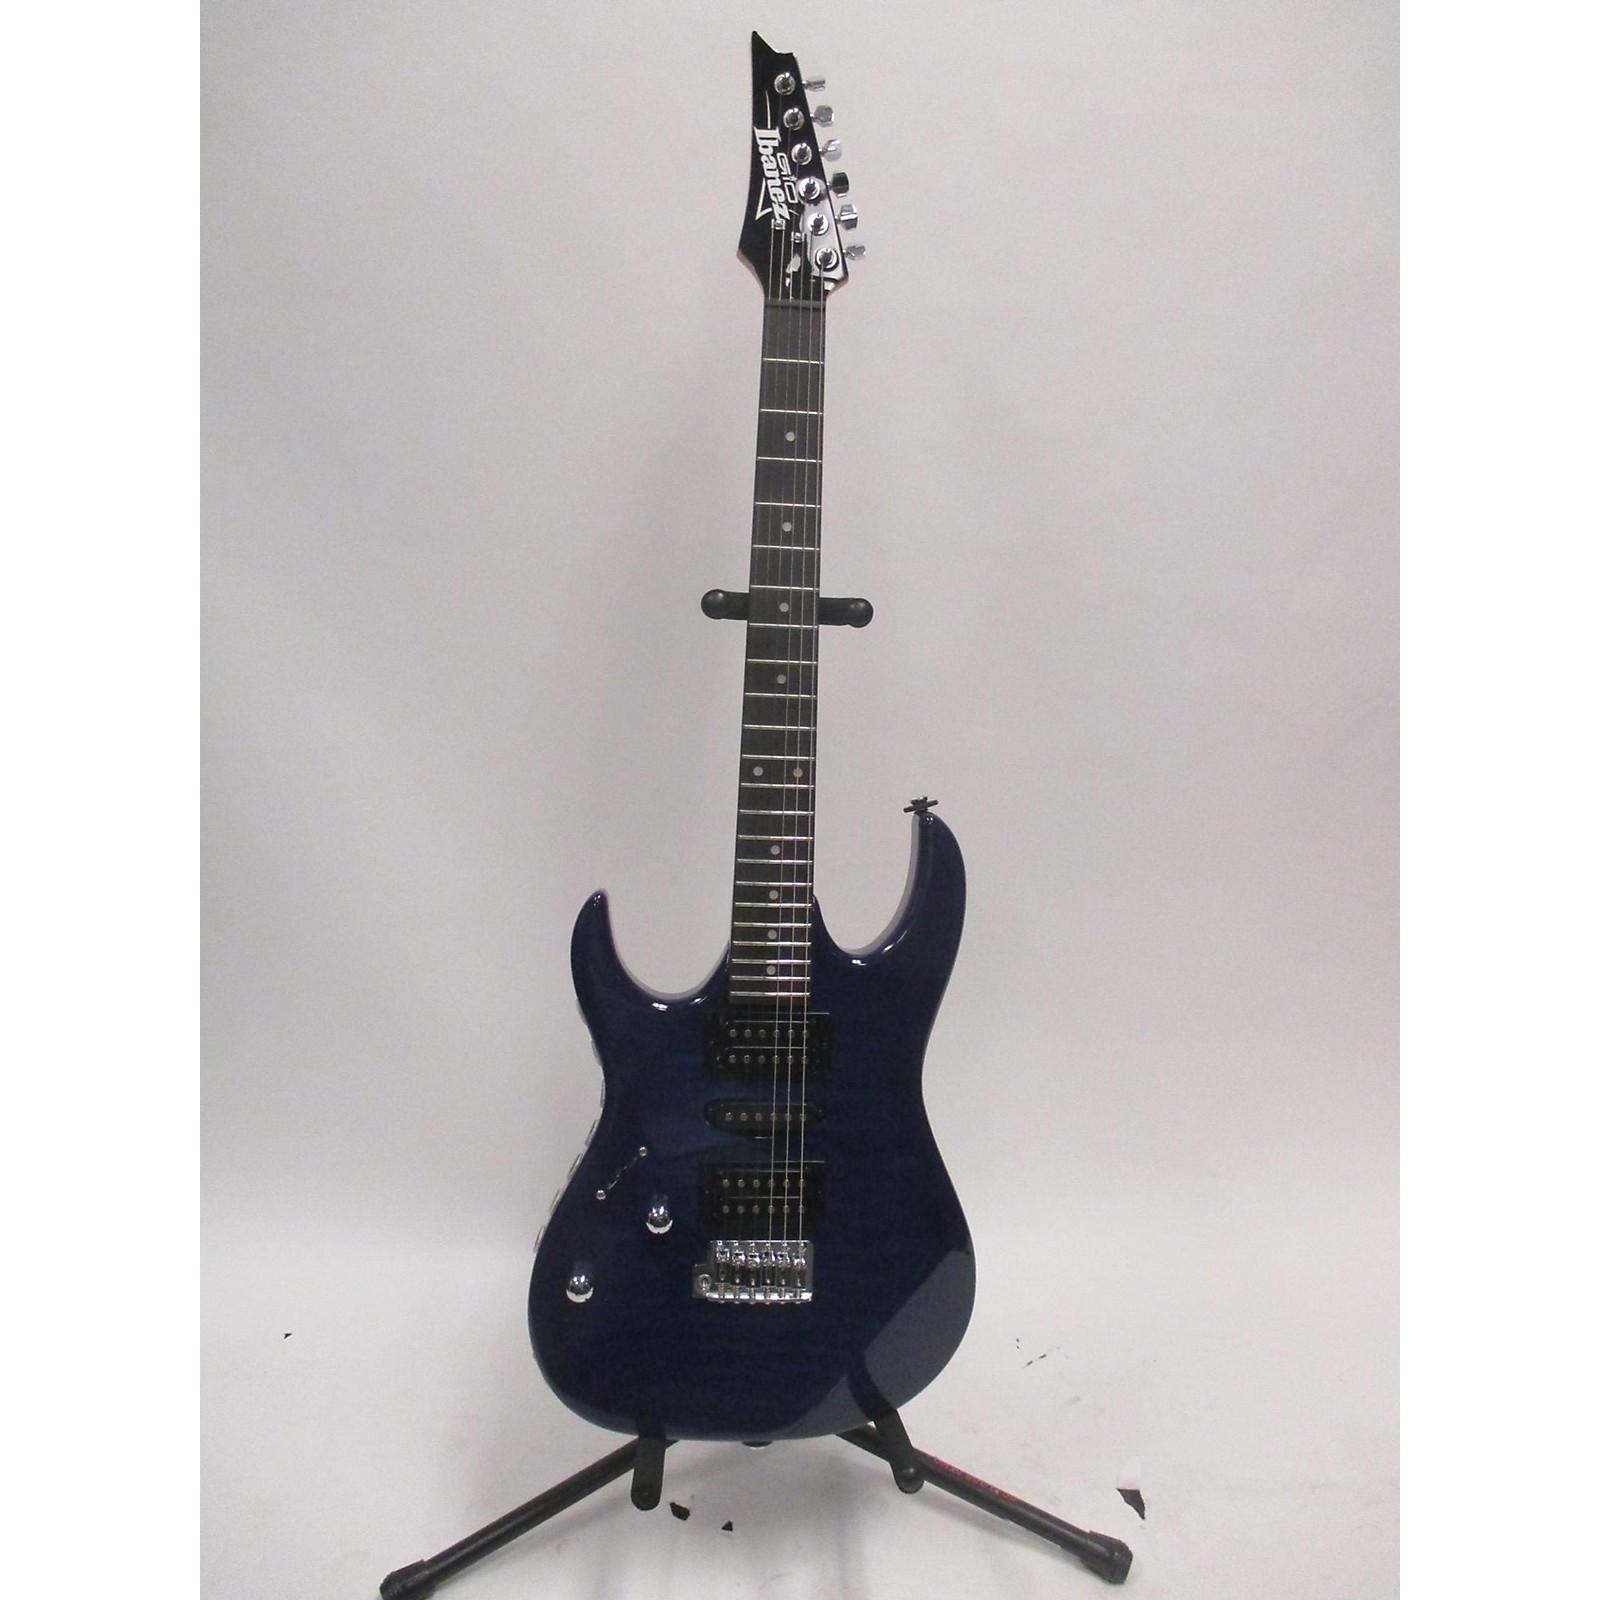 Ibanez GRX70QA Solid Body Electric Guitar